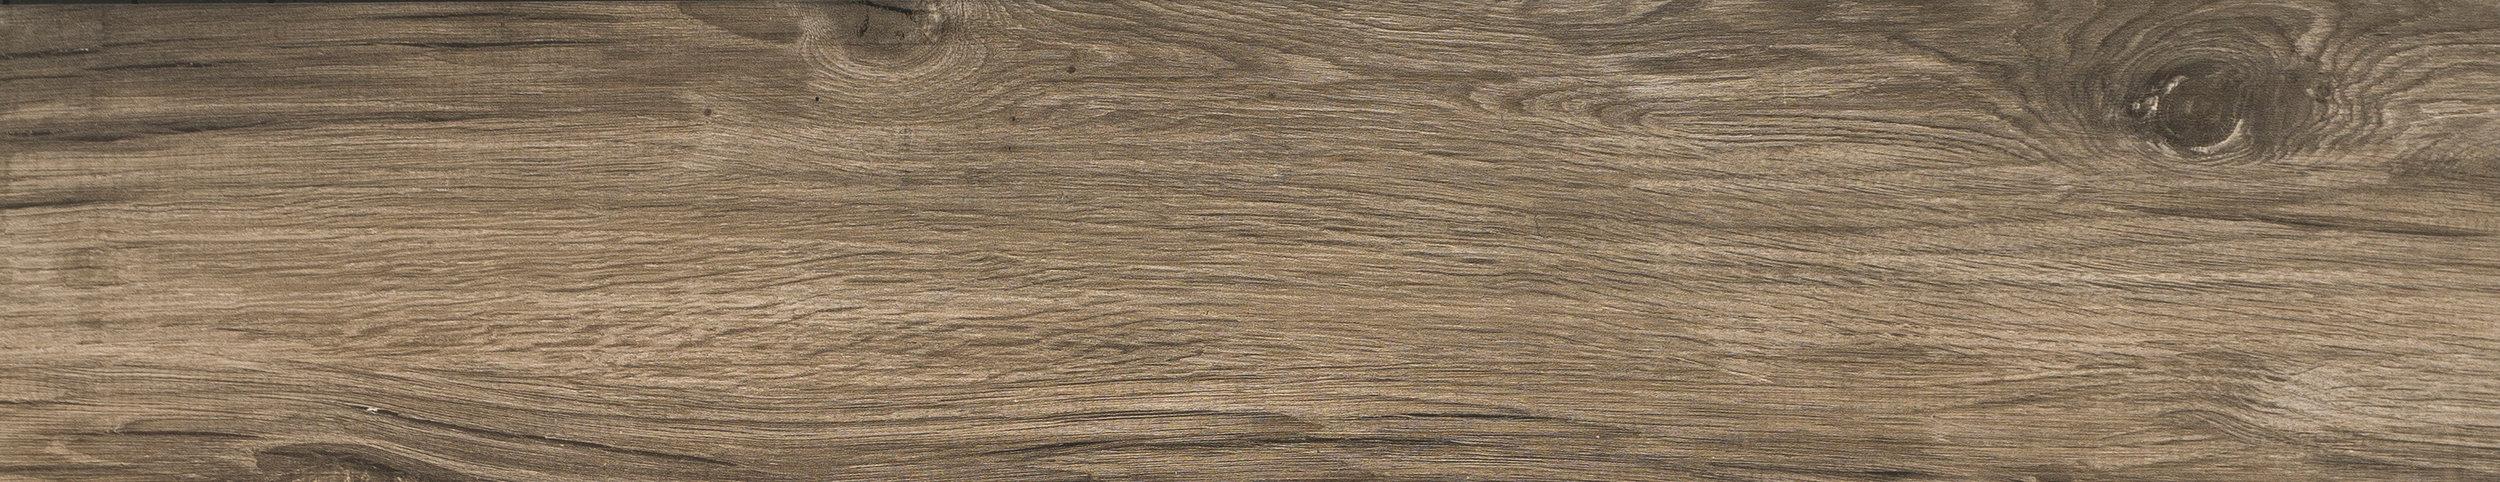 "log wood 6.5"" x 39.25"" taupe"